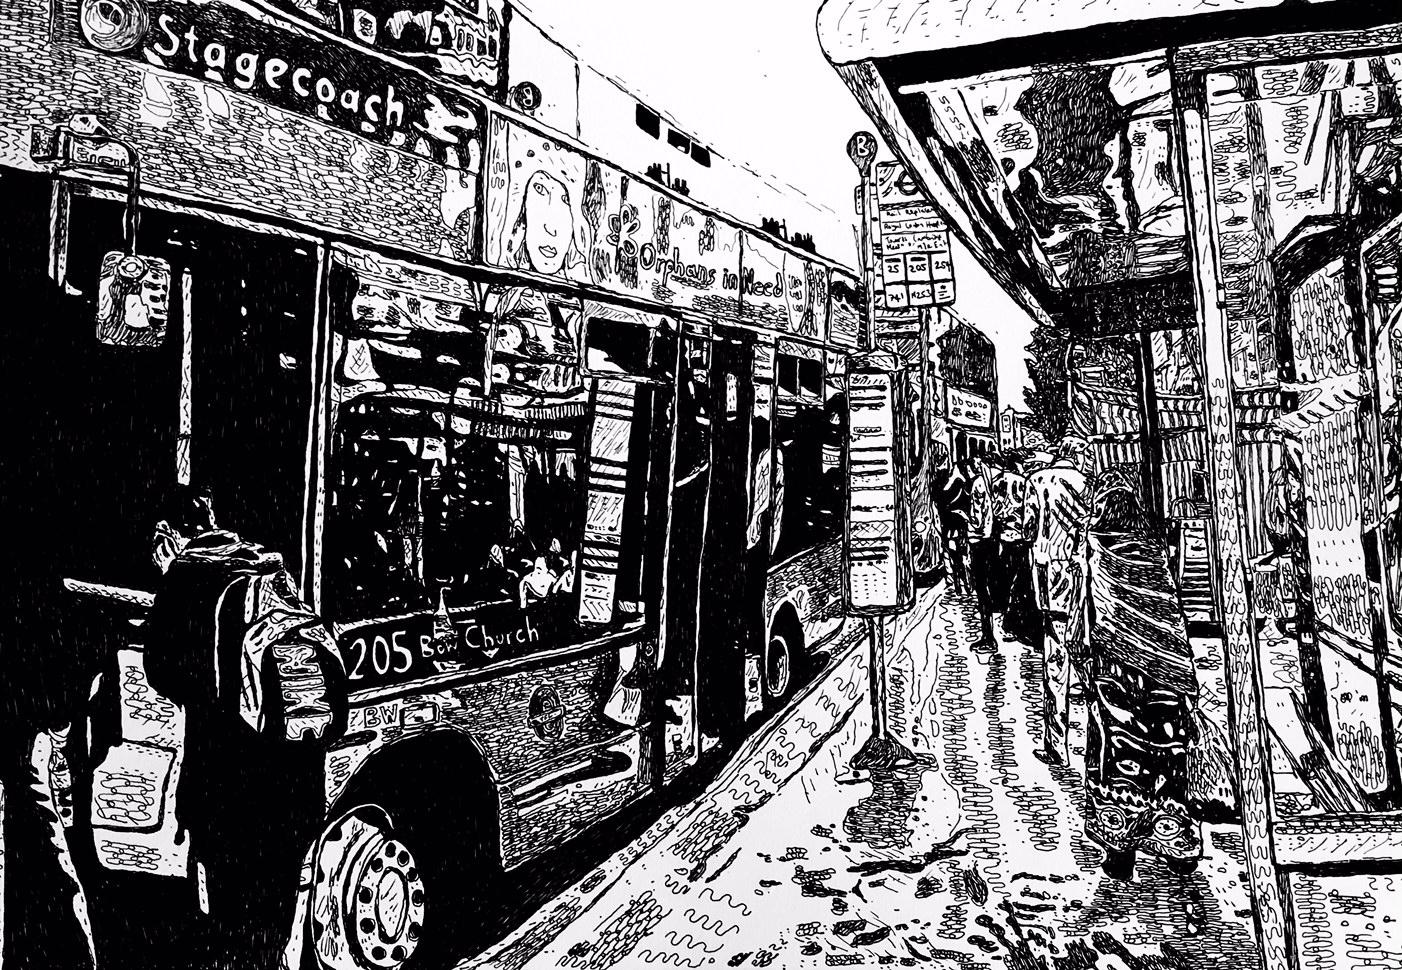 Bus Stop, Whitechapel 2014